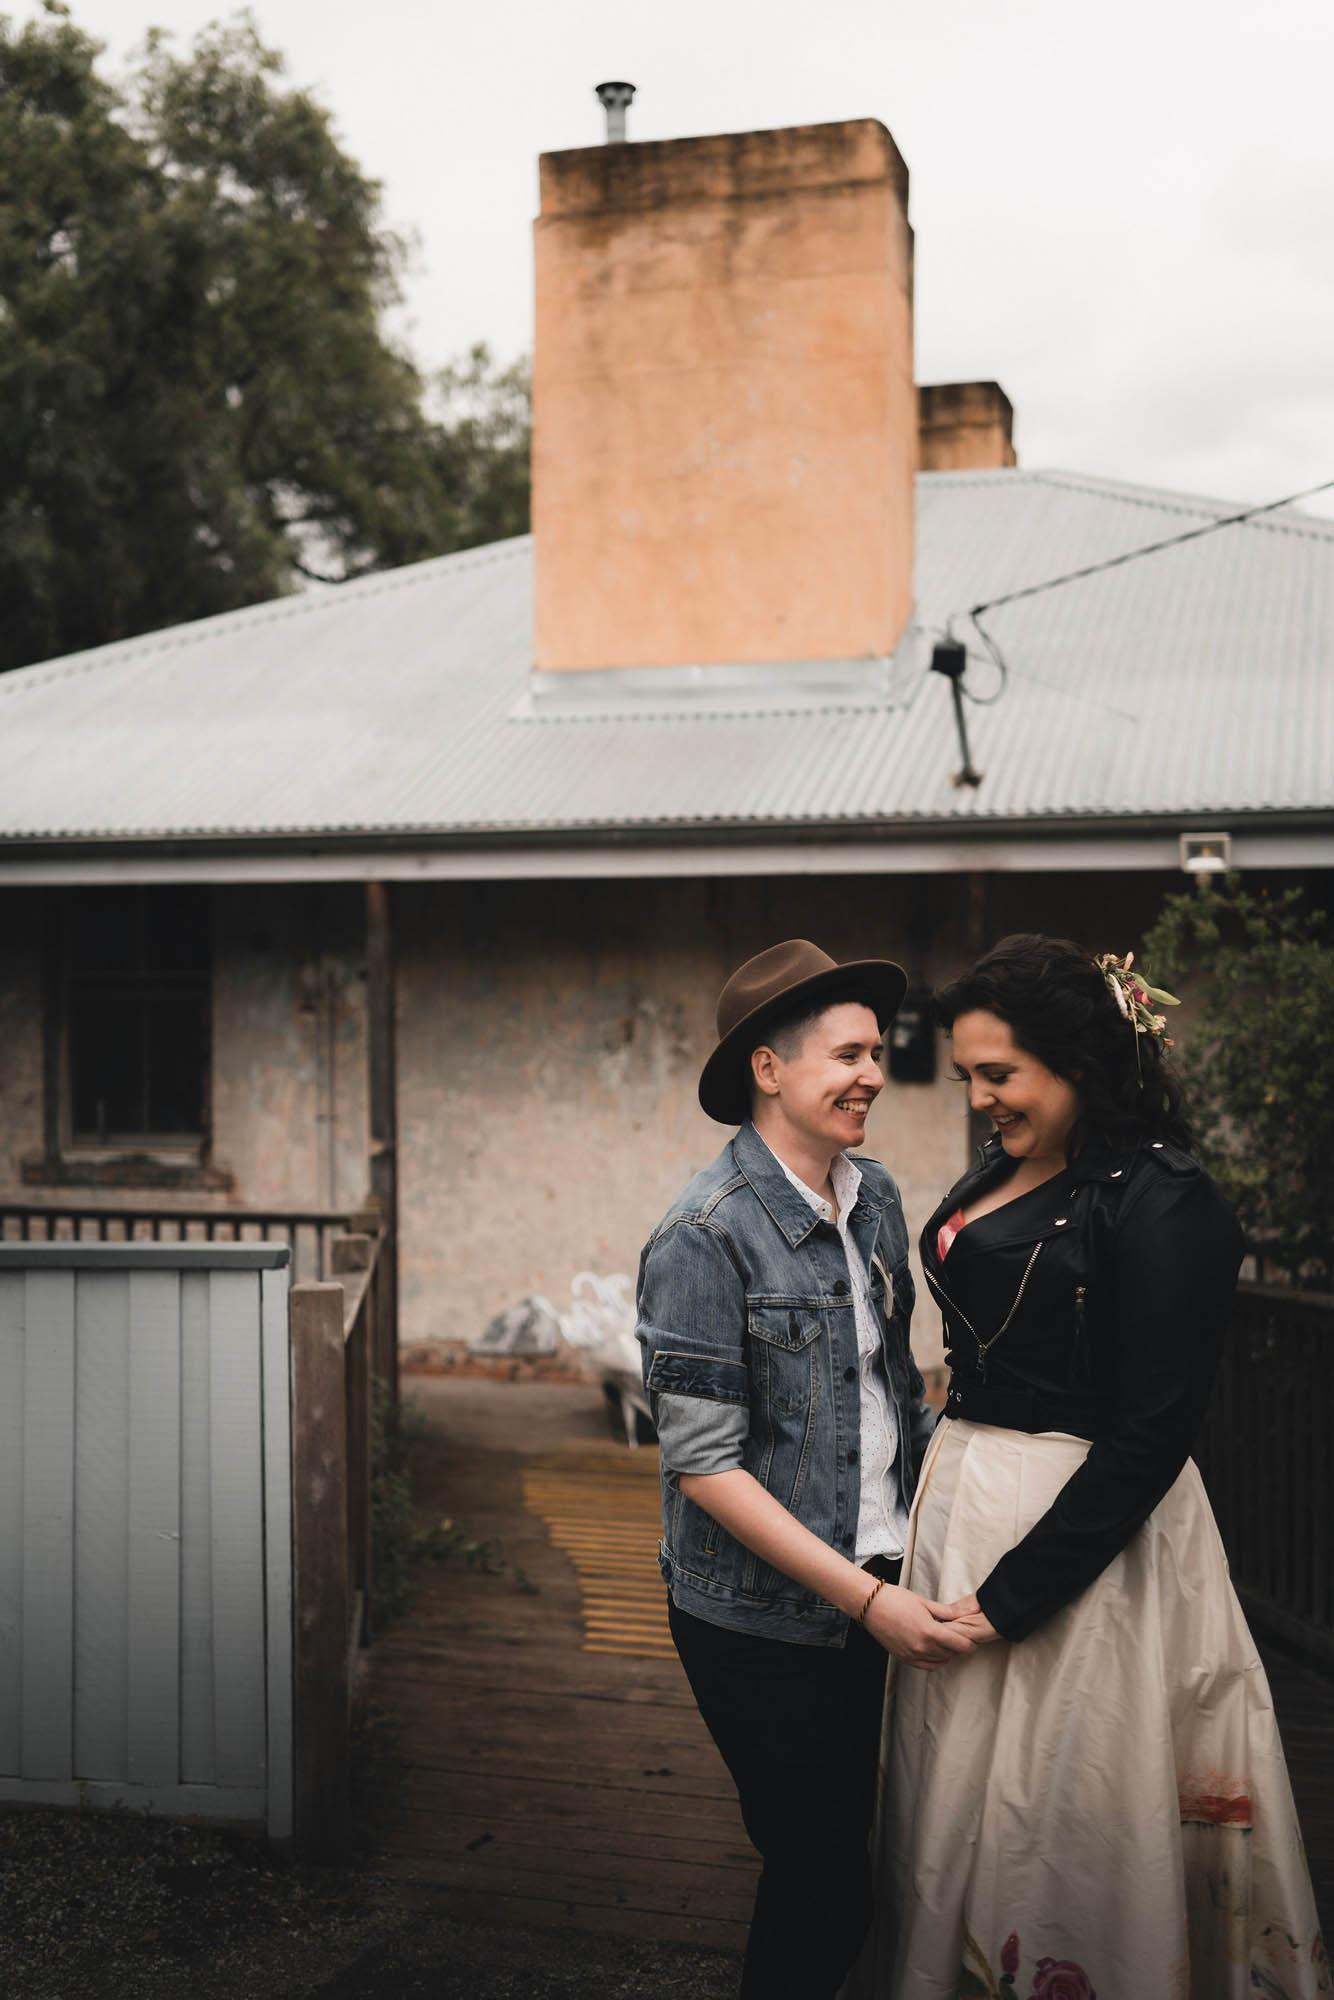 Collingwood Childrens Farm Wedding - Same-Sex Wedding Inspiration Melbourne